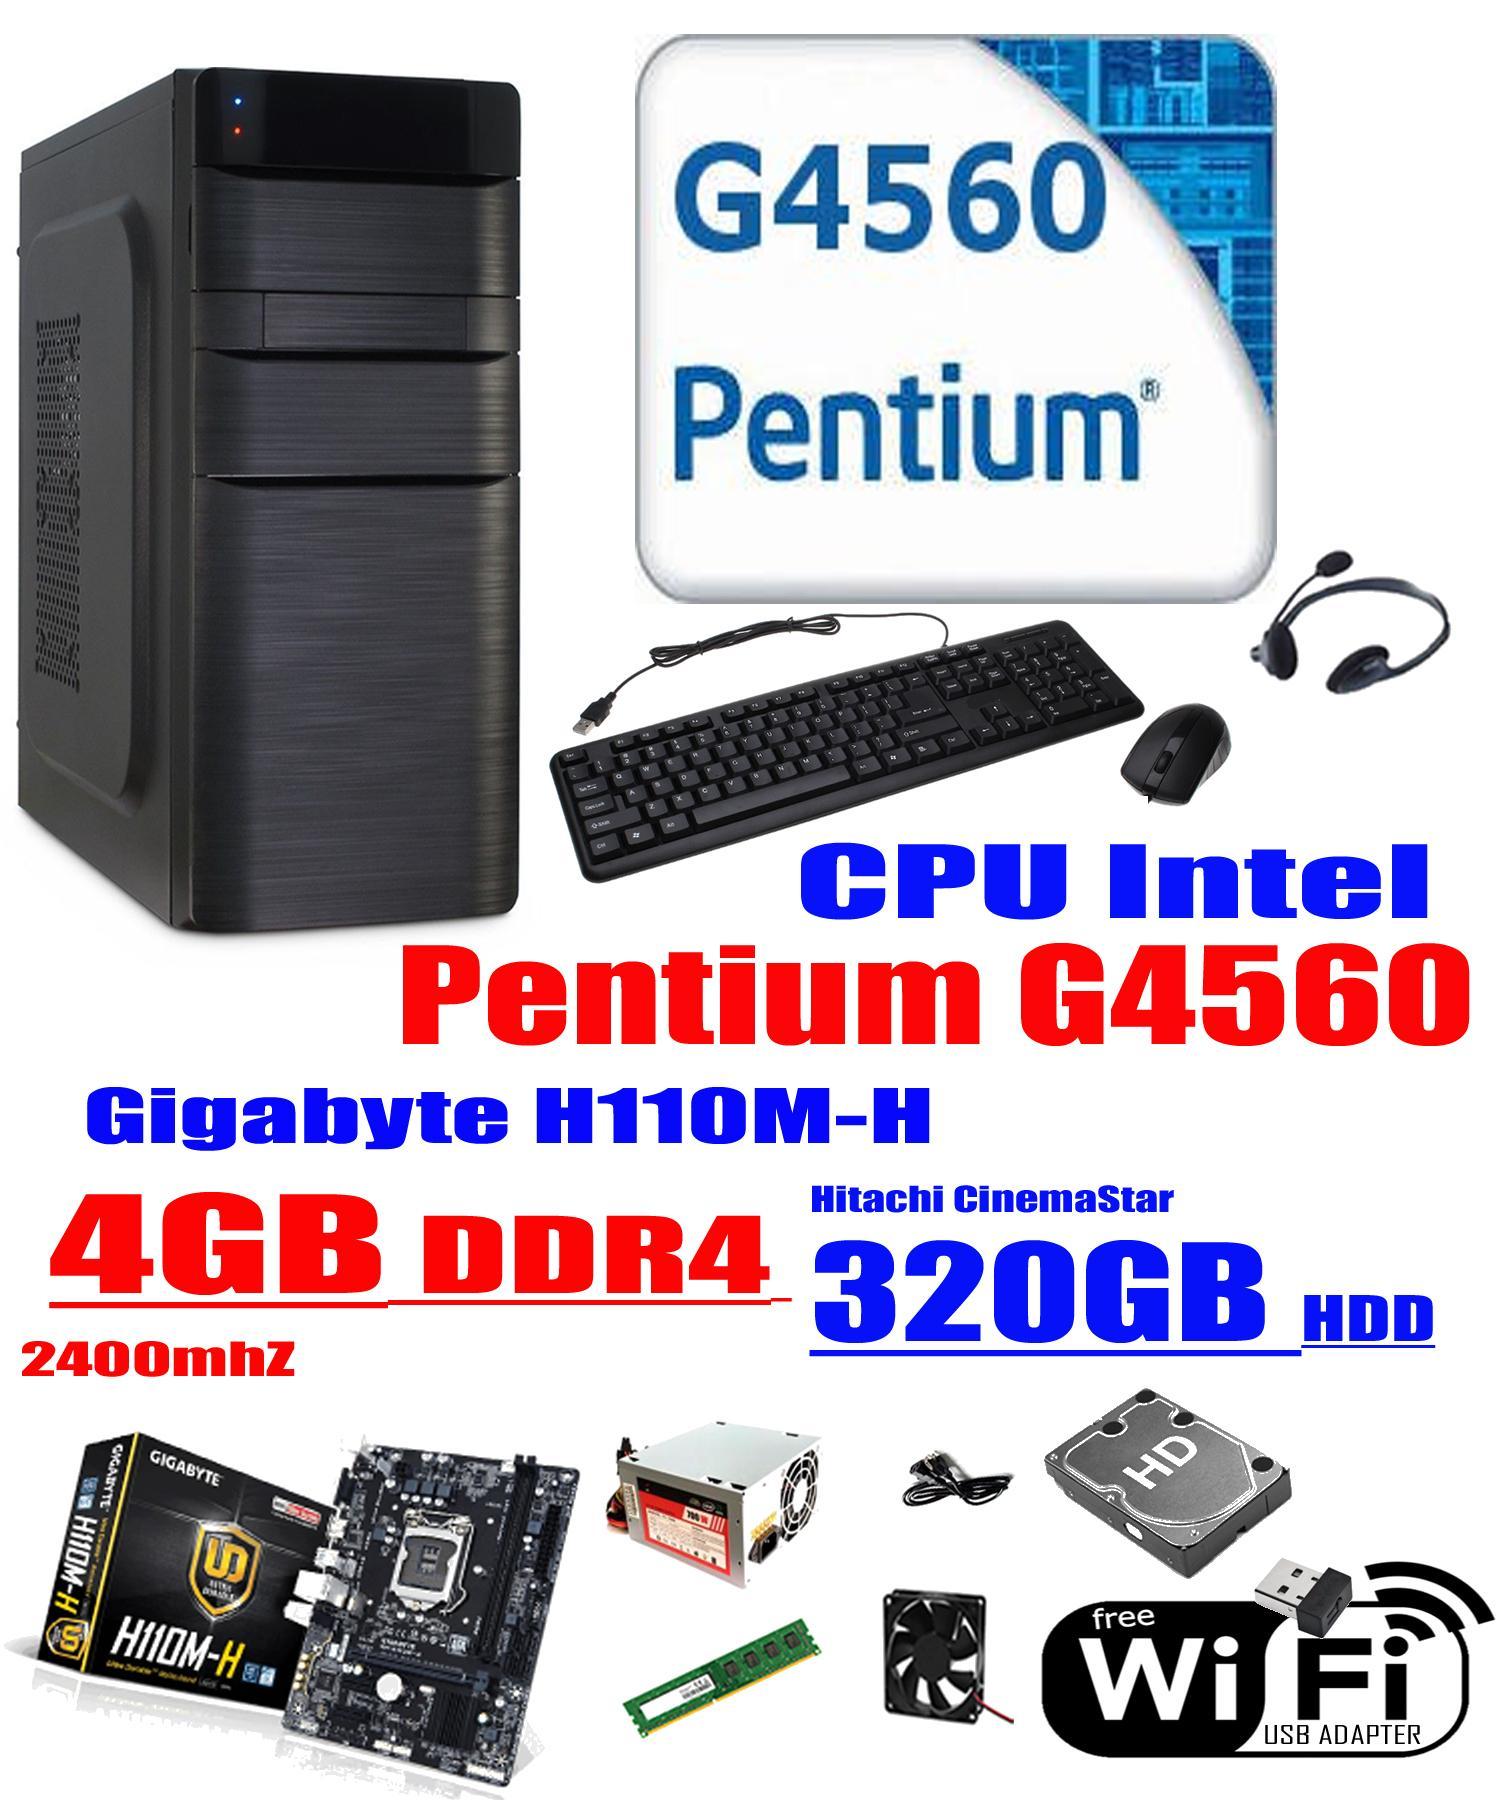 The Cheapest Price Intel Pentium G4600 36 Ghz 3mb Cache Desktop 36ghz Kabylake Socket 1151 Gigabyte Cpu 4gb G4560 Kaby Lake Dual Core 35 Ga H110m H Ddr4 2400mhz 320gb Hitachi Cinemastar Sata